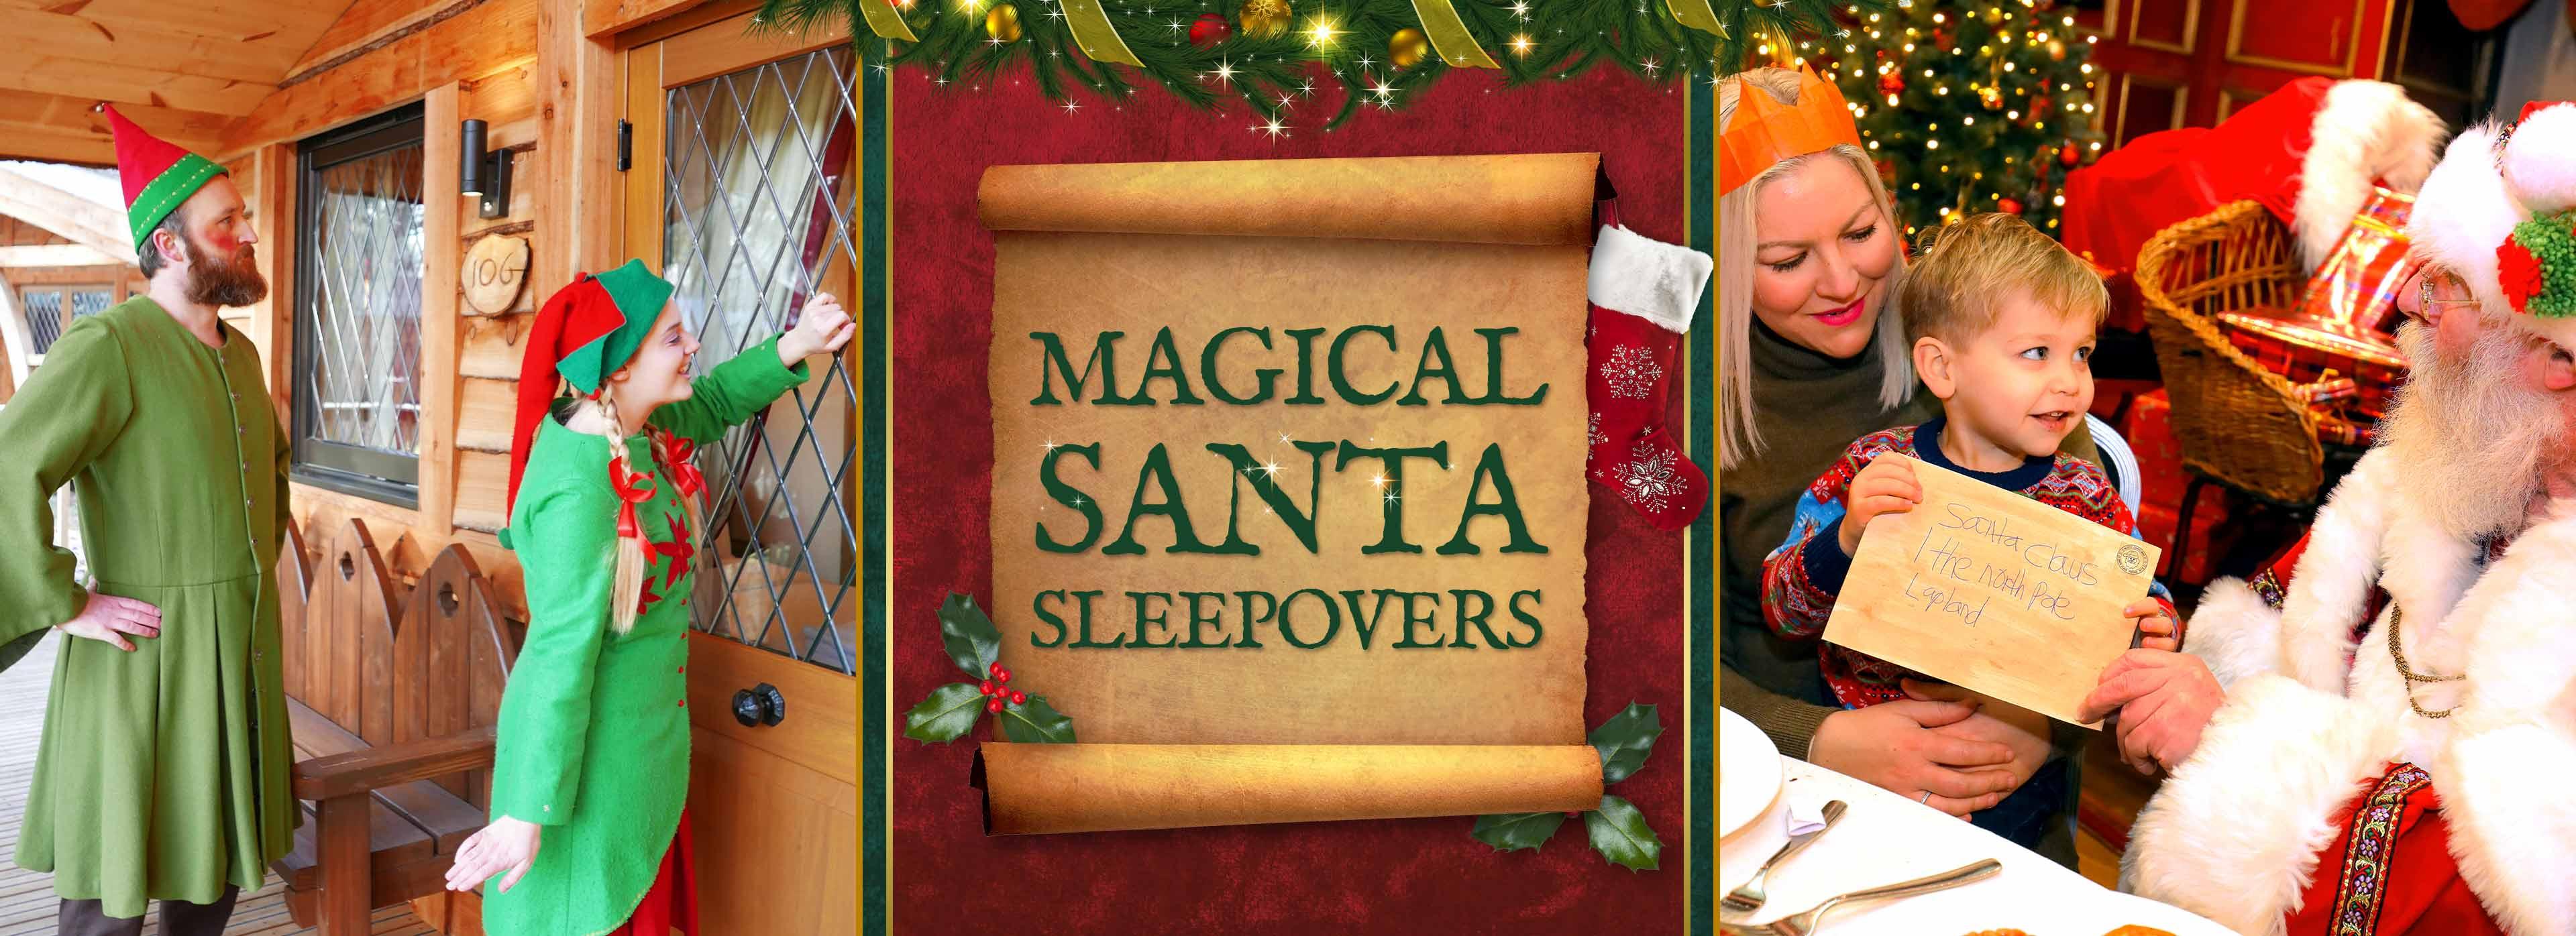 Santa Sleepovers 2019 at Warwick Castle